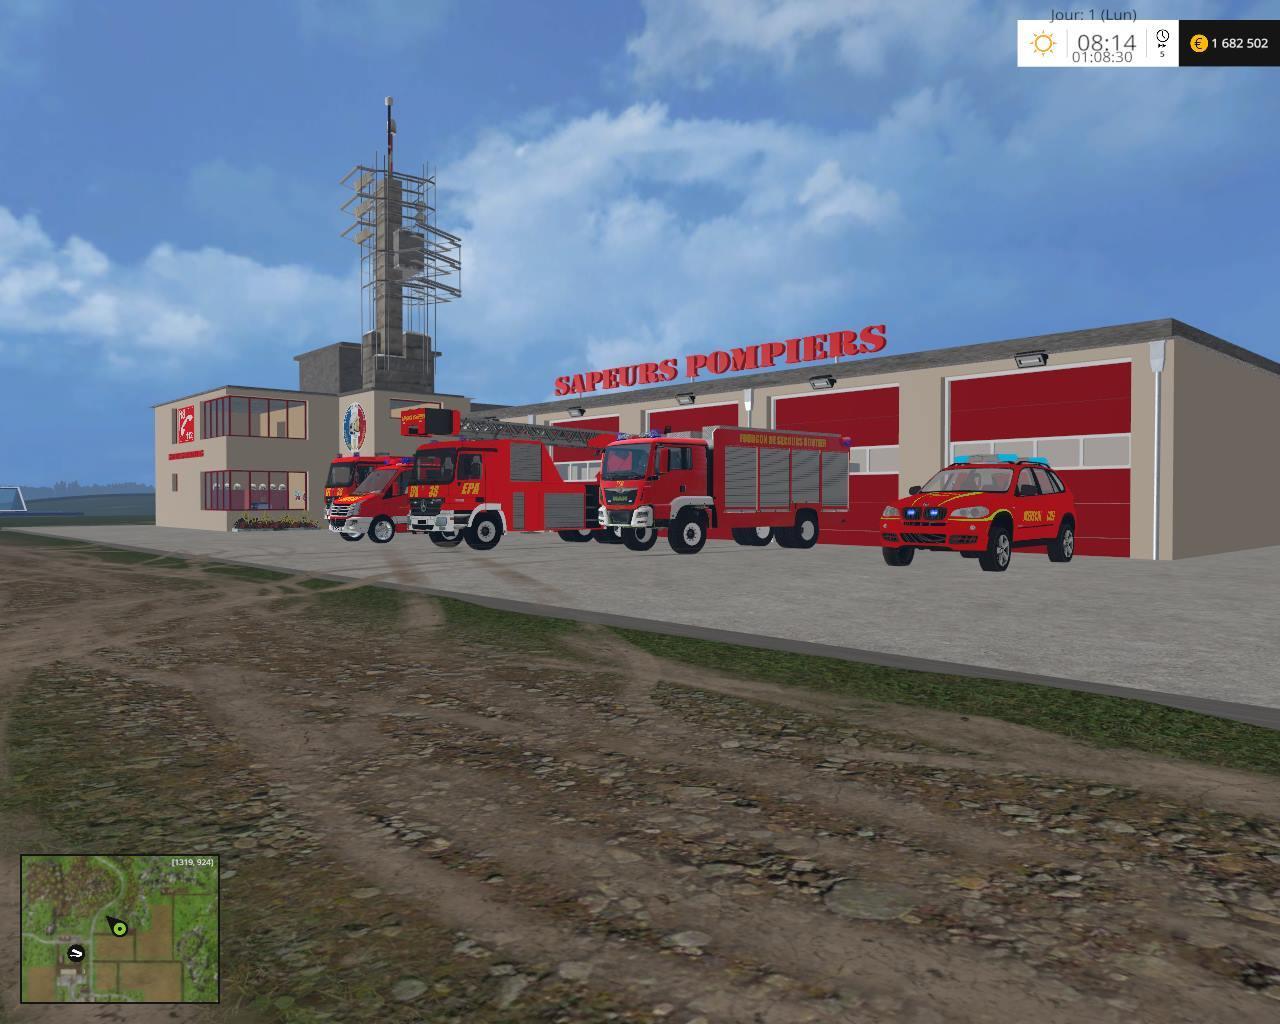 FS 15 Objects - Farming simulator 19, 17, 15 mods | FS19, 17